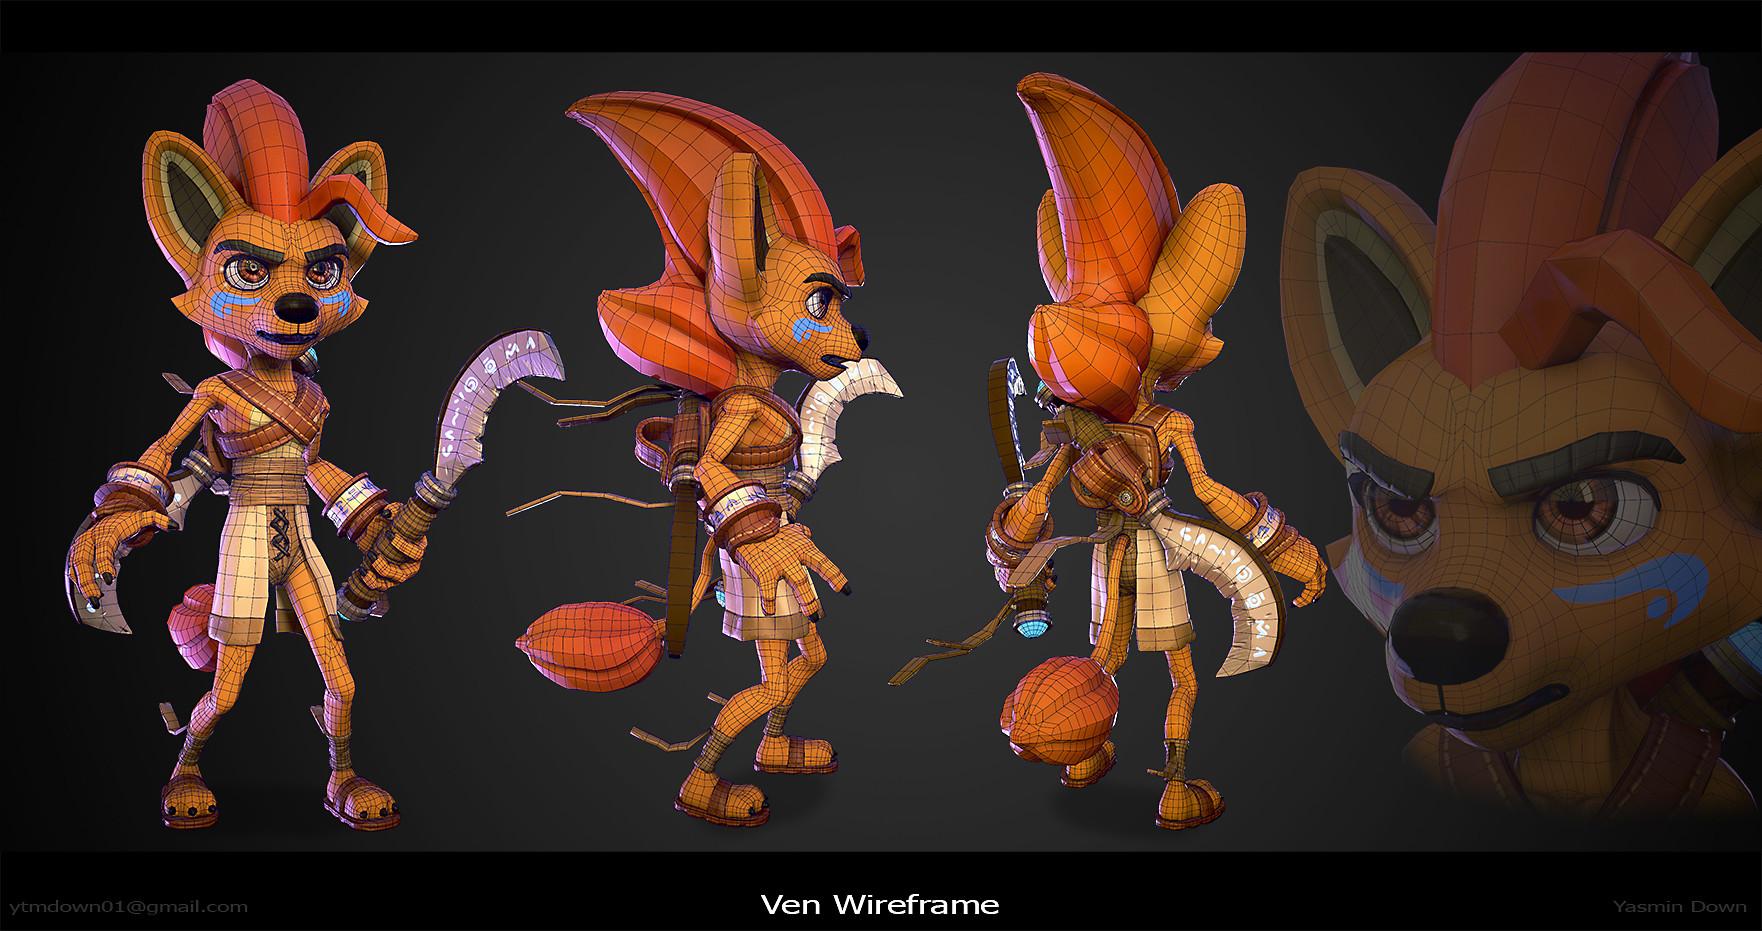 Yasmin down ven wireframes